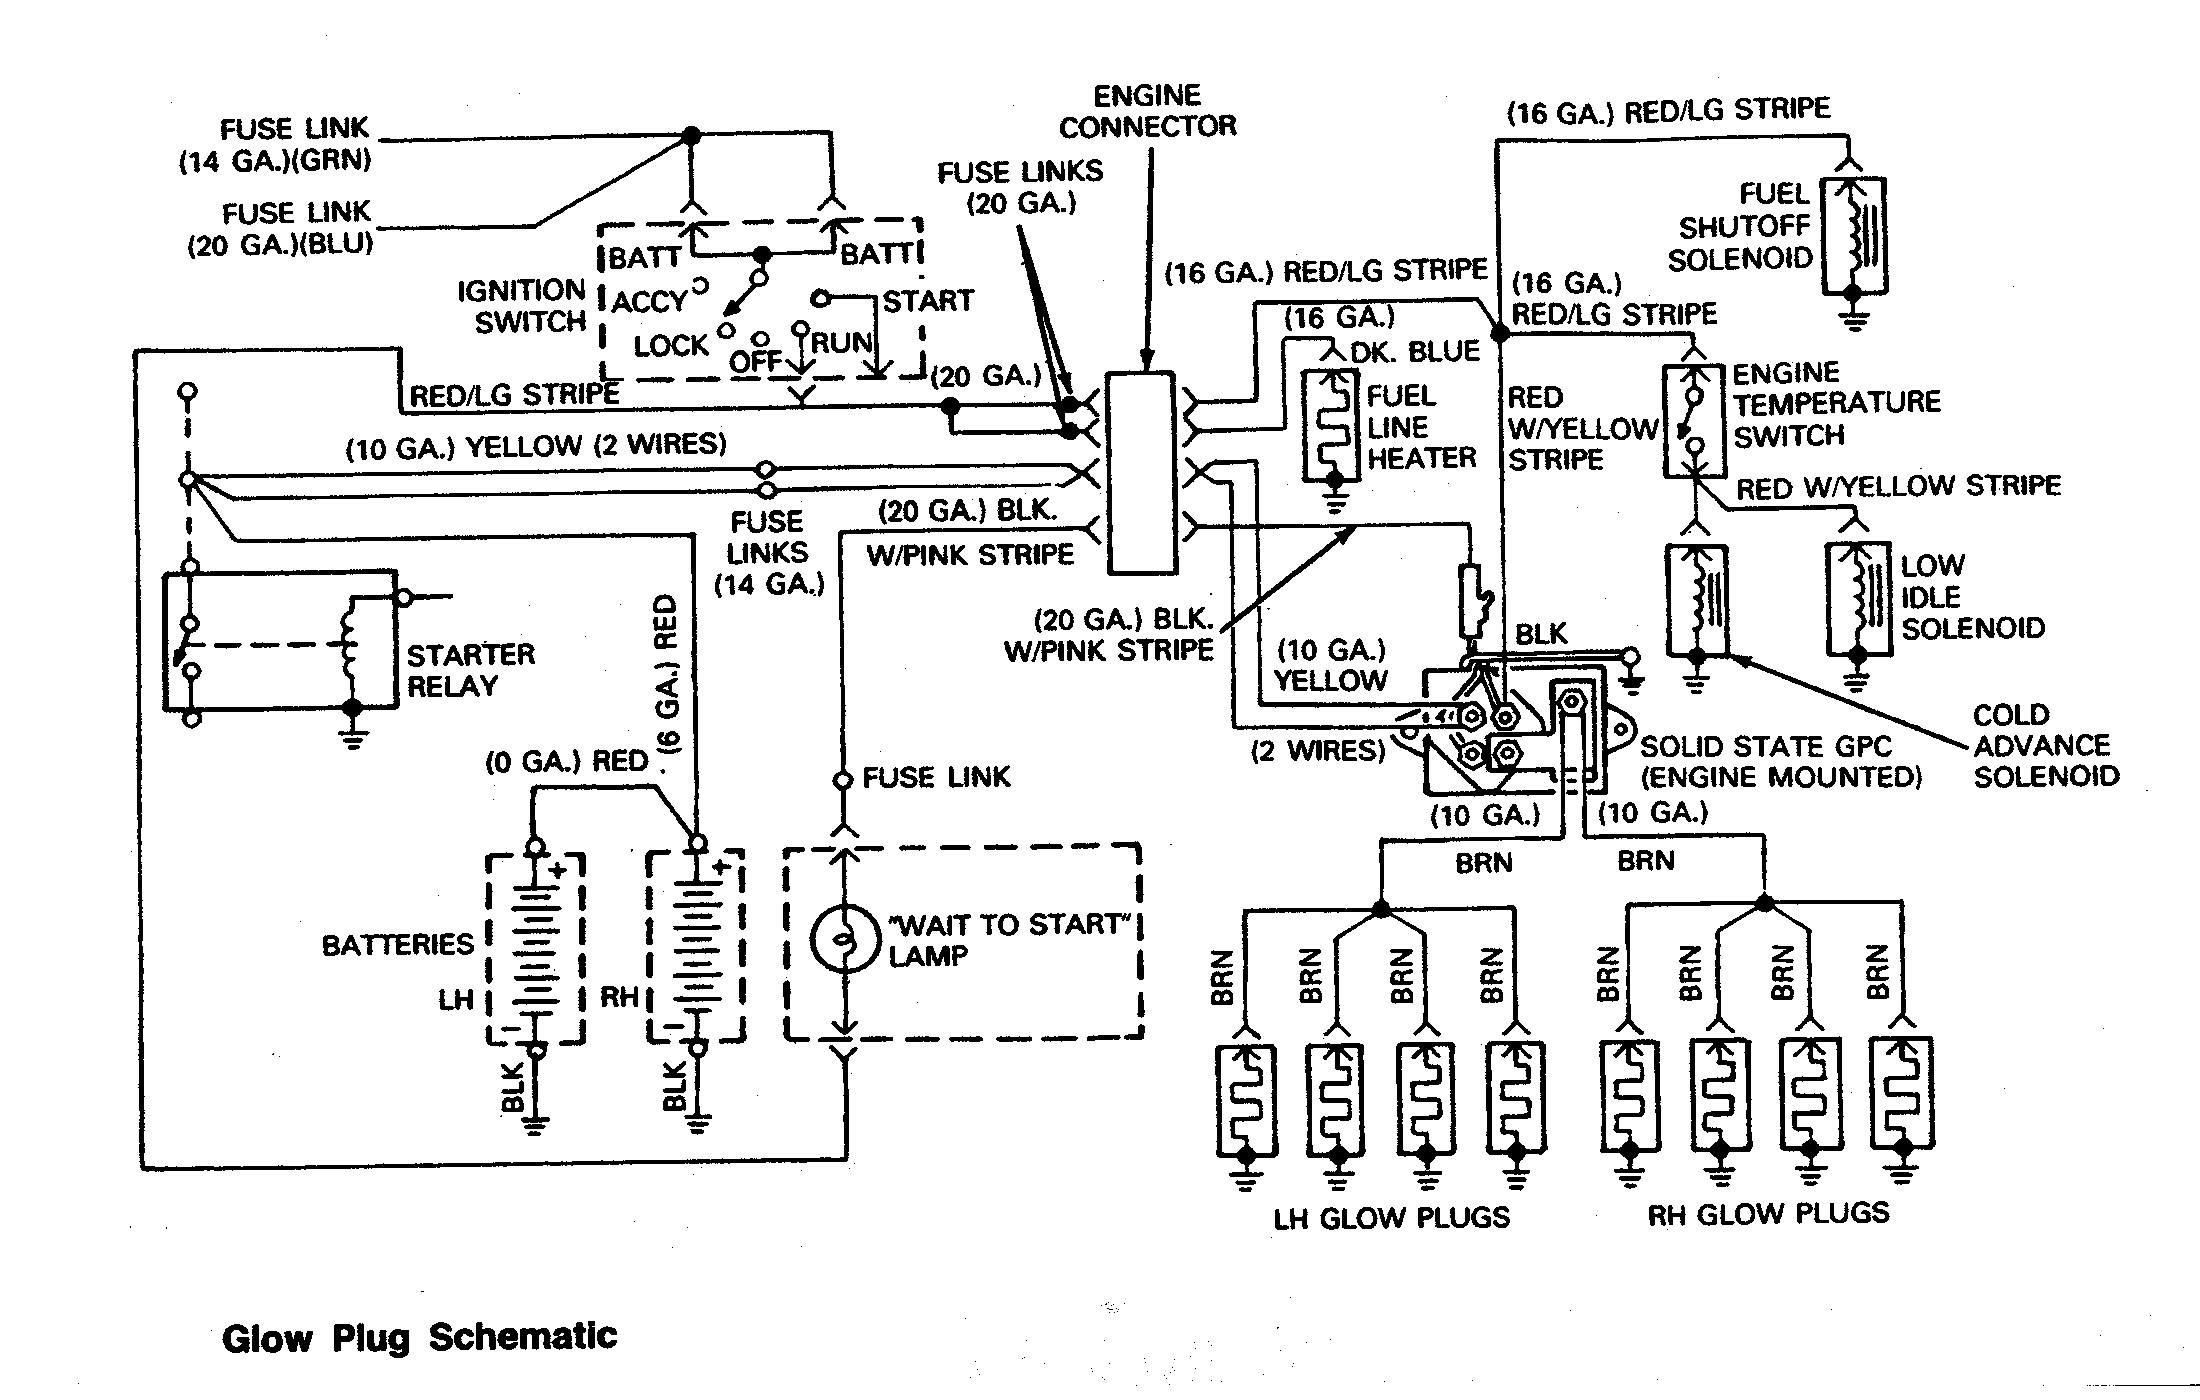 Diagram Of 4 Stroke Engine Glow Engine Diagram Experts Wiring Diagram • Of Diagram Of 4 Stroke Engine